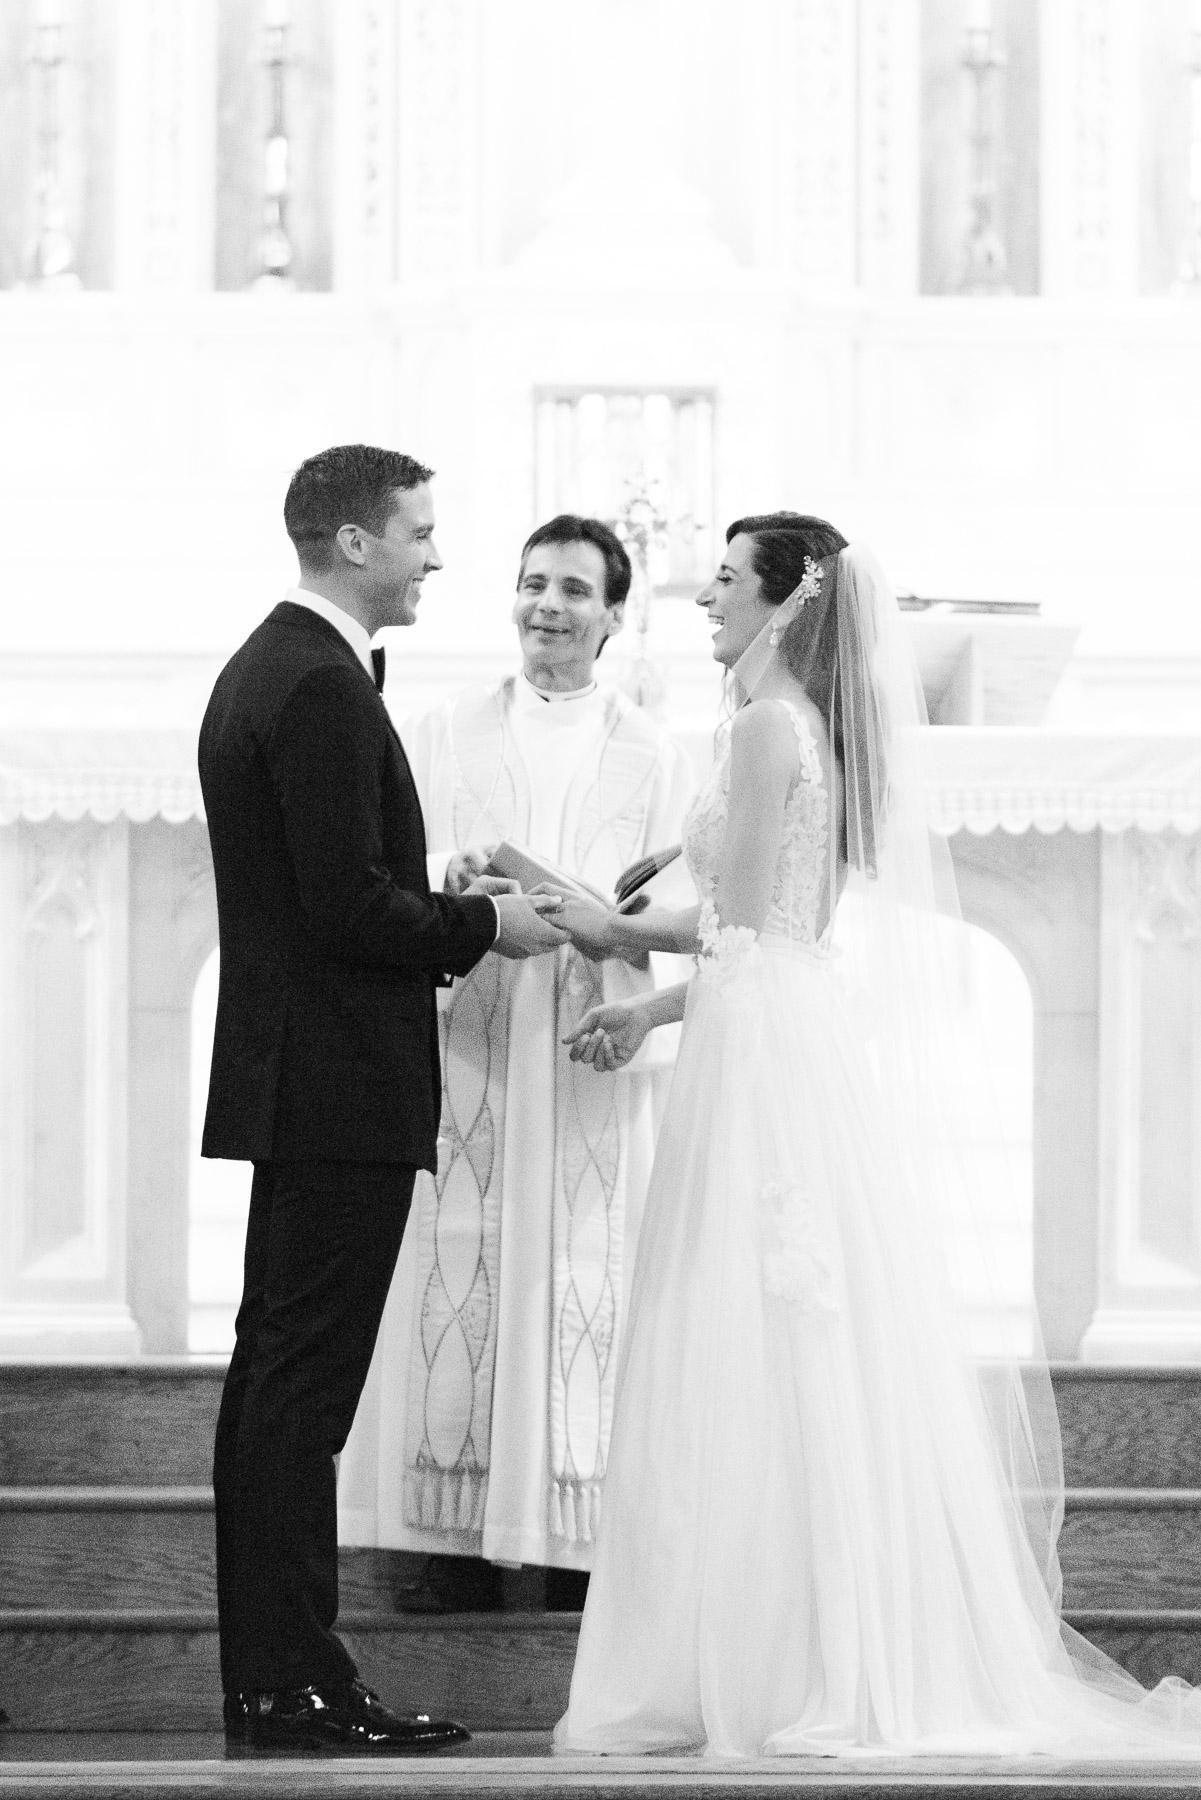 Black and White Wedding Church Ceremony Photo